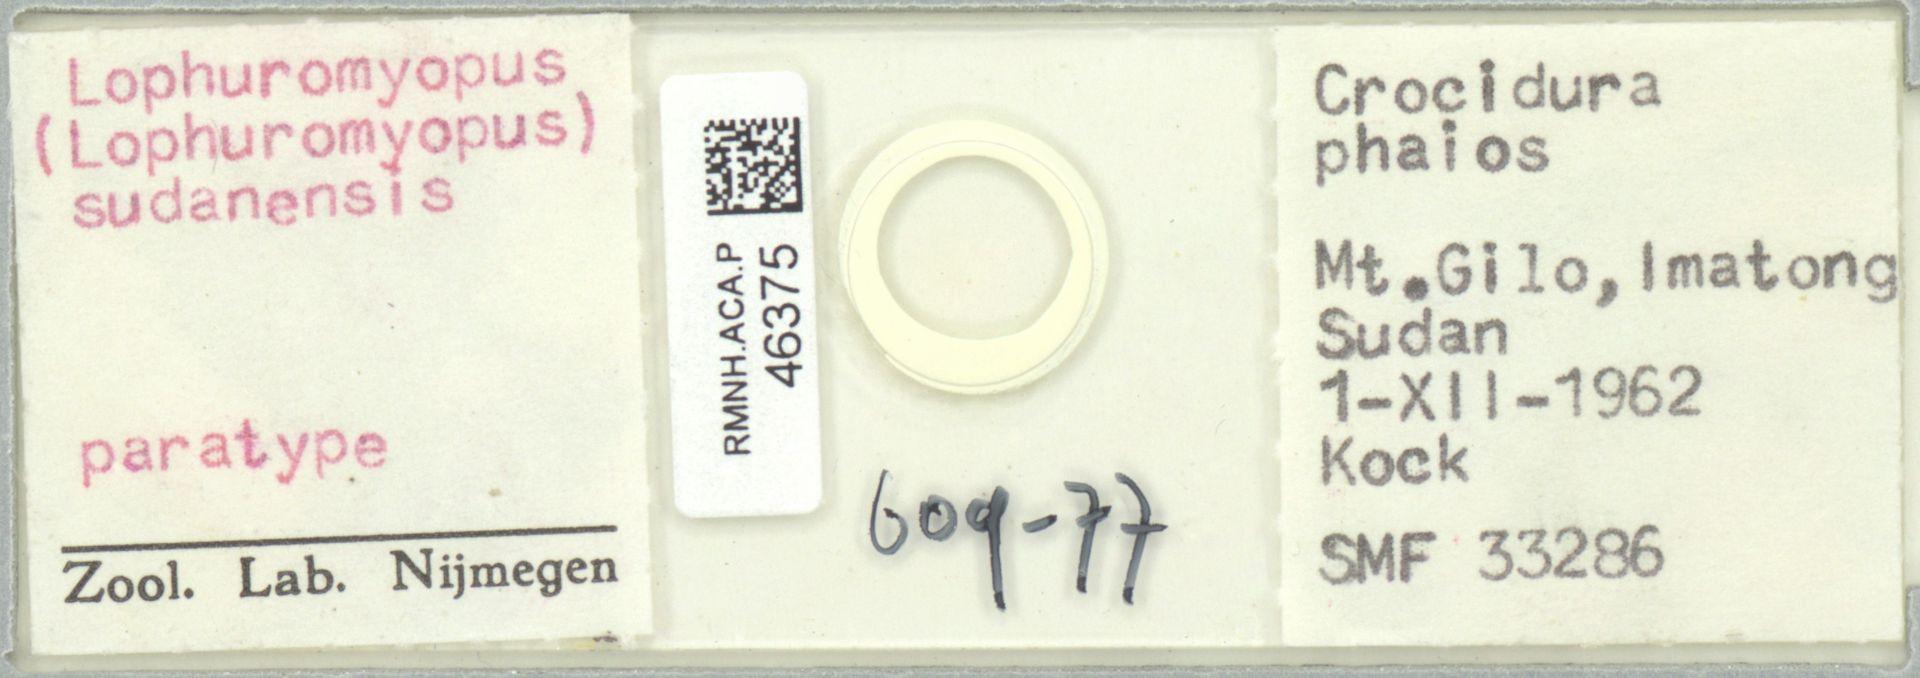 RMNH.ACA.P.46375 | Lophuromyopus (Lophuromyopus) sudanensis